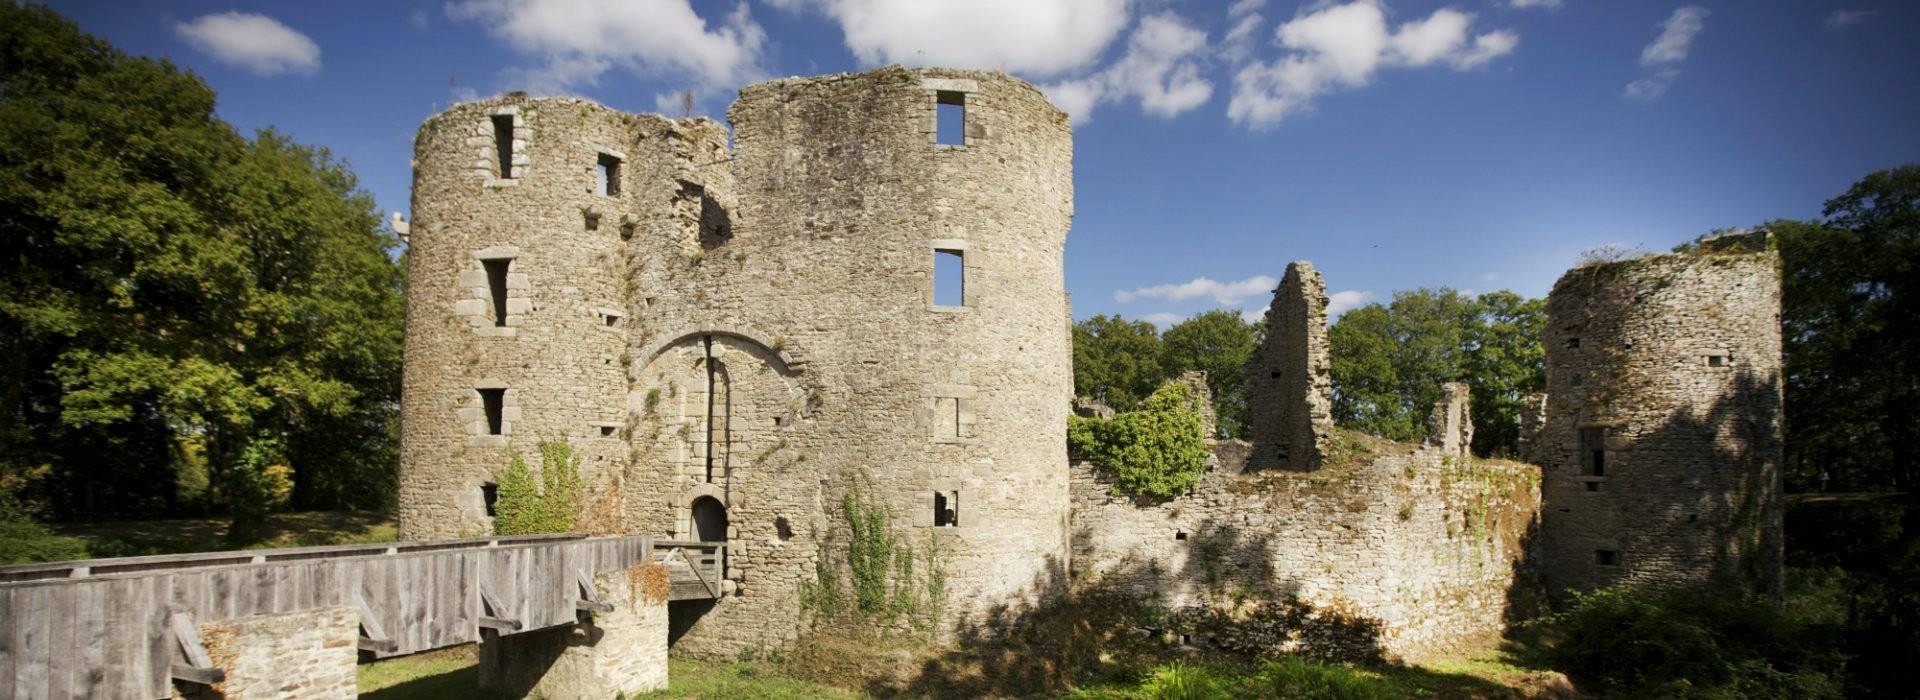 Château de Ranrouët à Herbignac - Teddy Locquard